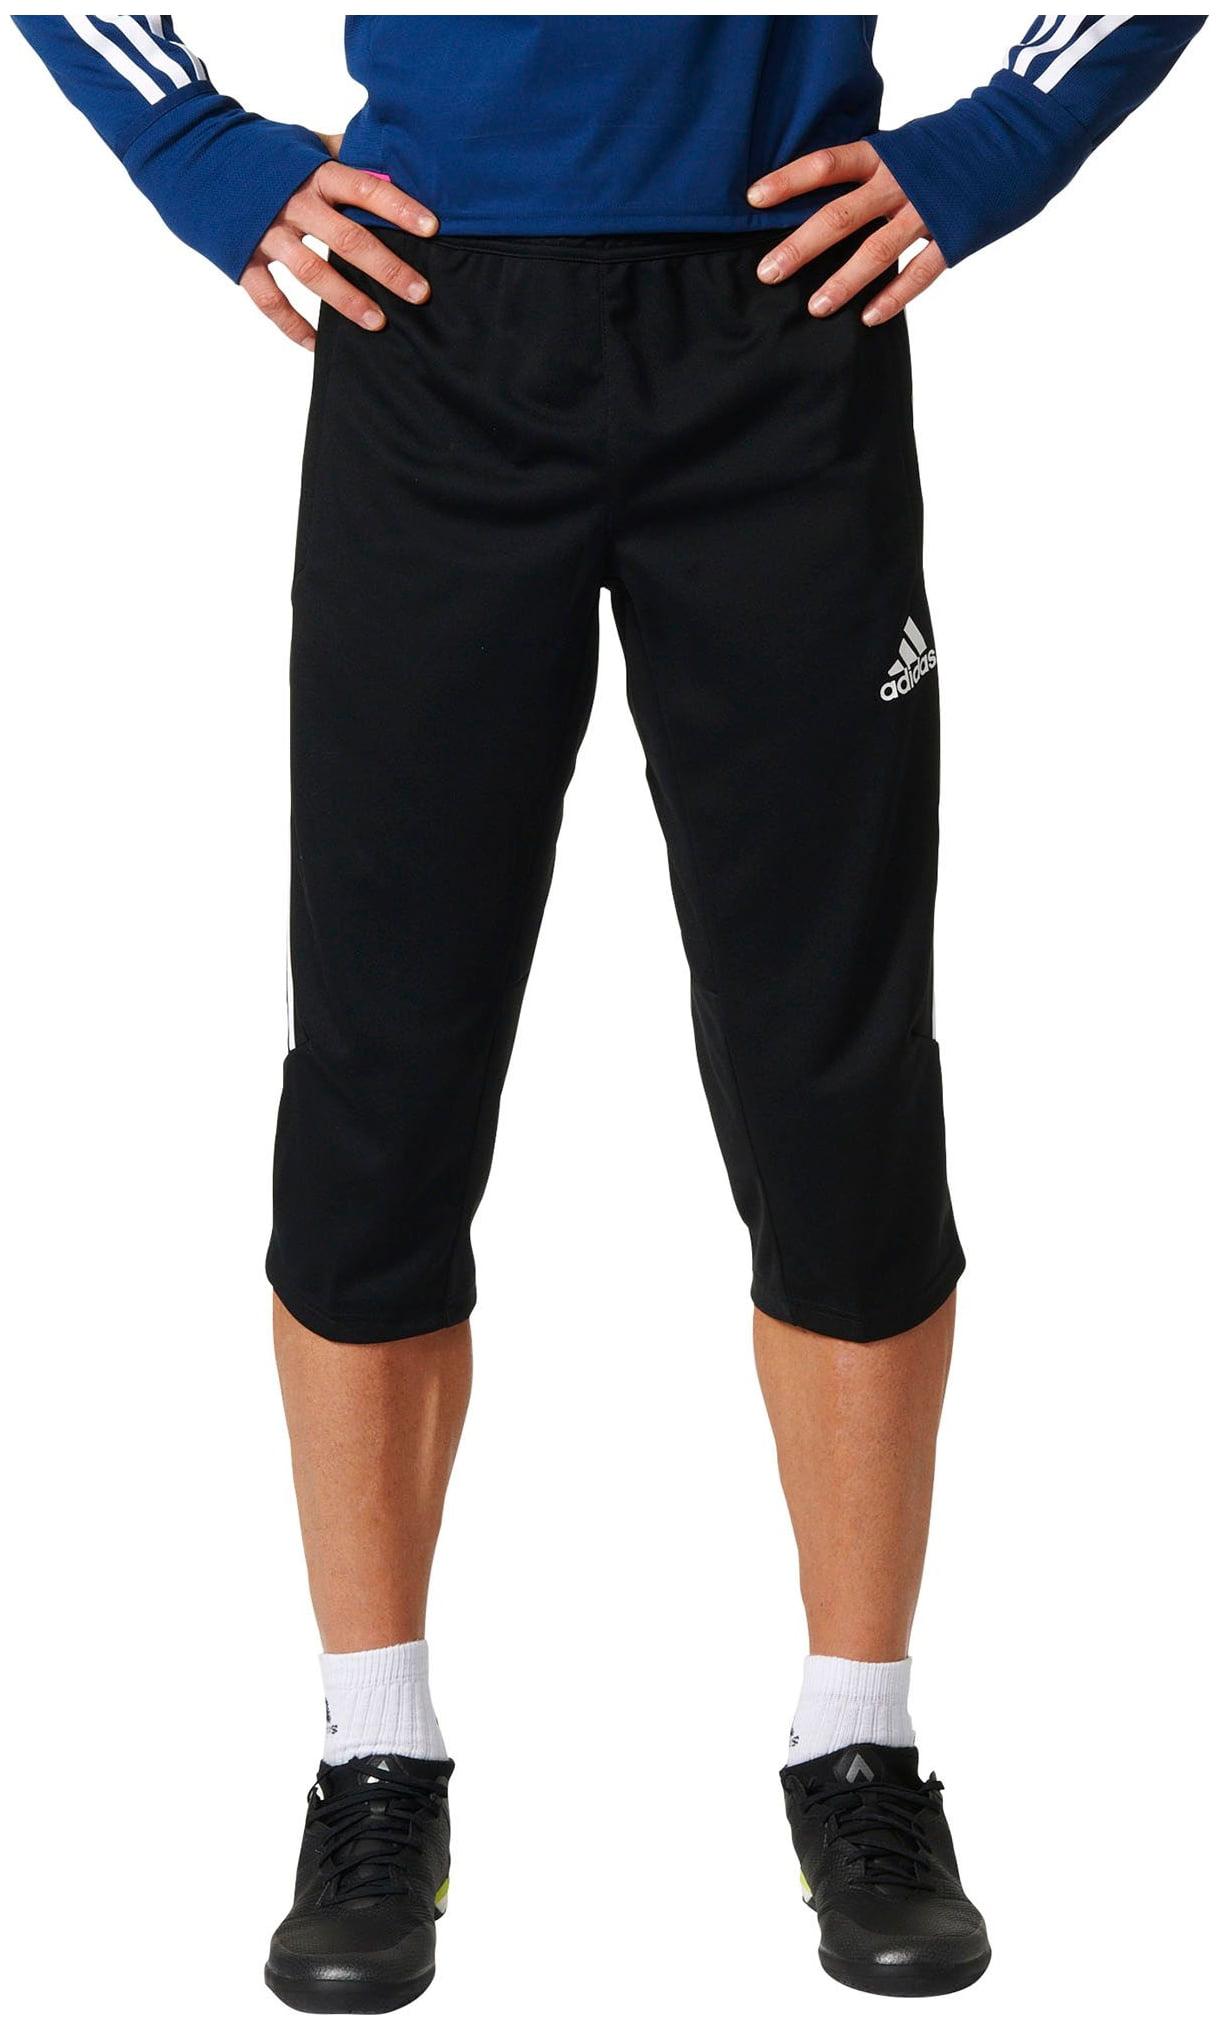 e2f17fd3f Adidas 3 4 Length Pants Men S - Pants Images and Photos ...